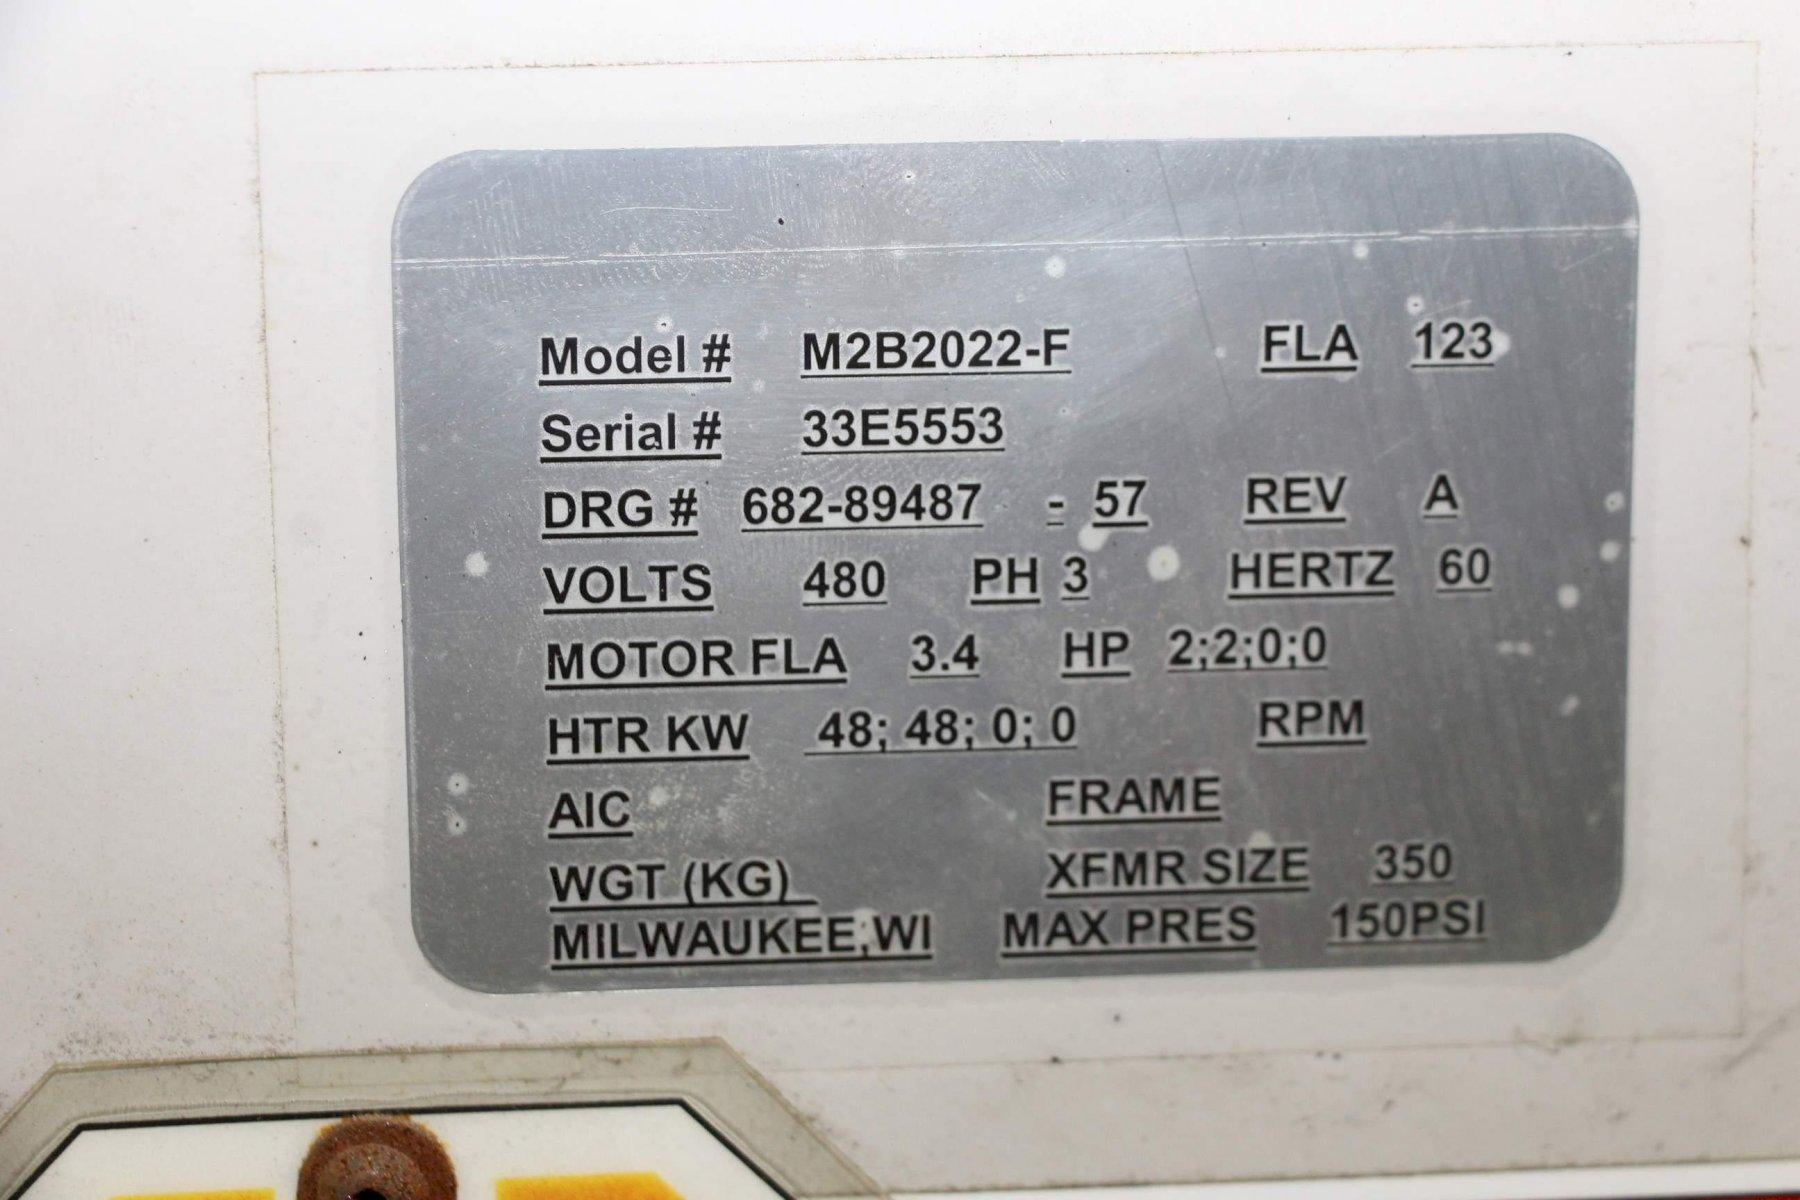 STERLCO MODEL M2B2022-F CONTROL UNIT: STOCK #